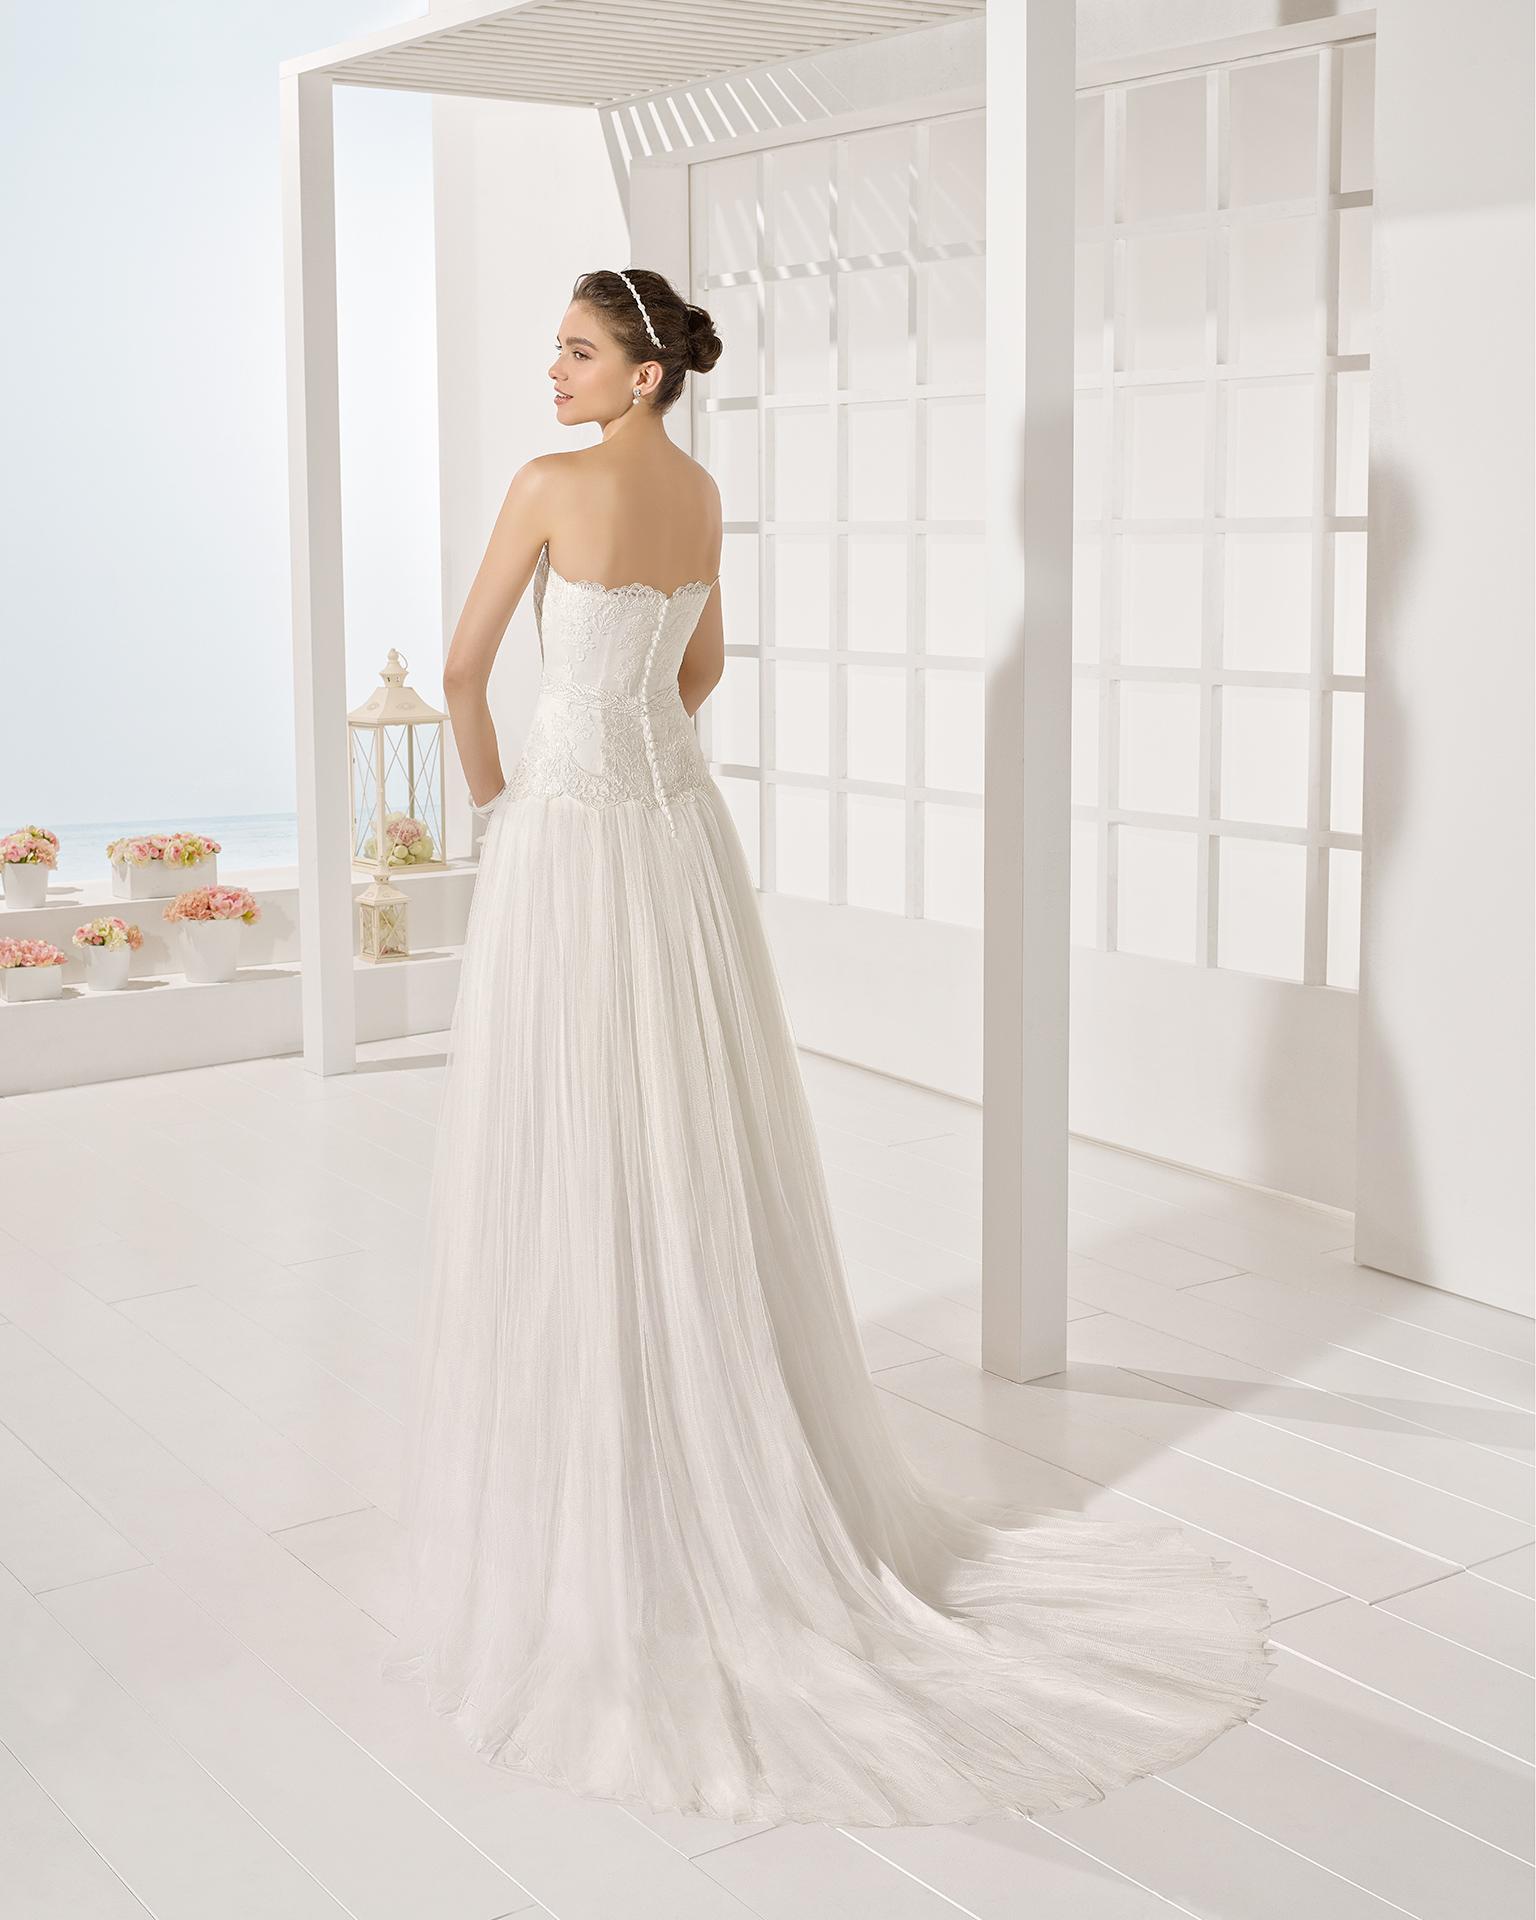 Yago wedding dress, Luna Novias 2017